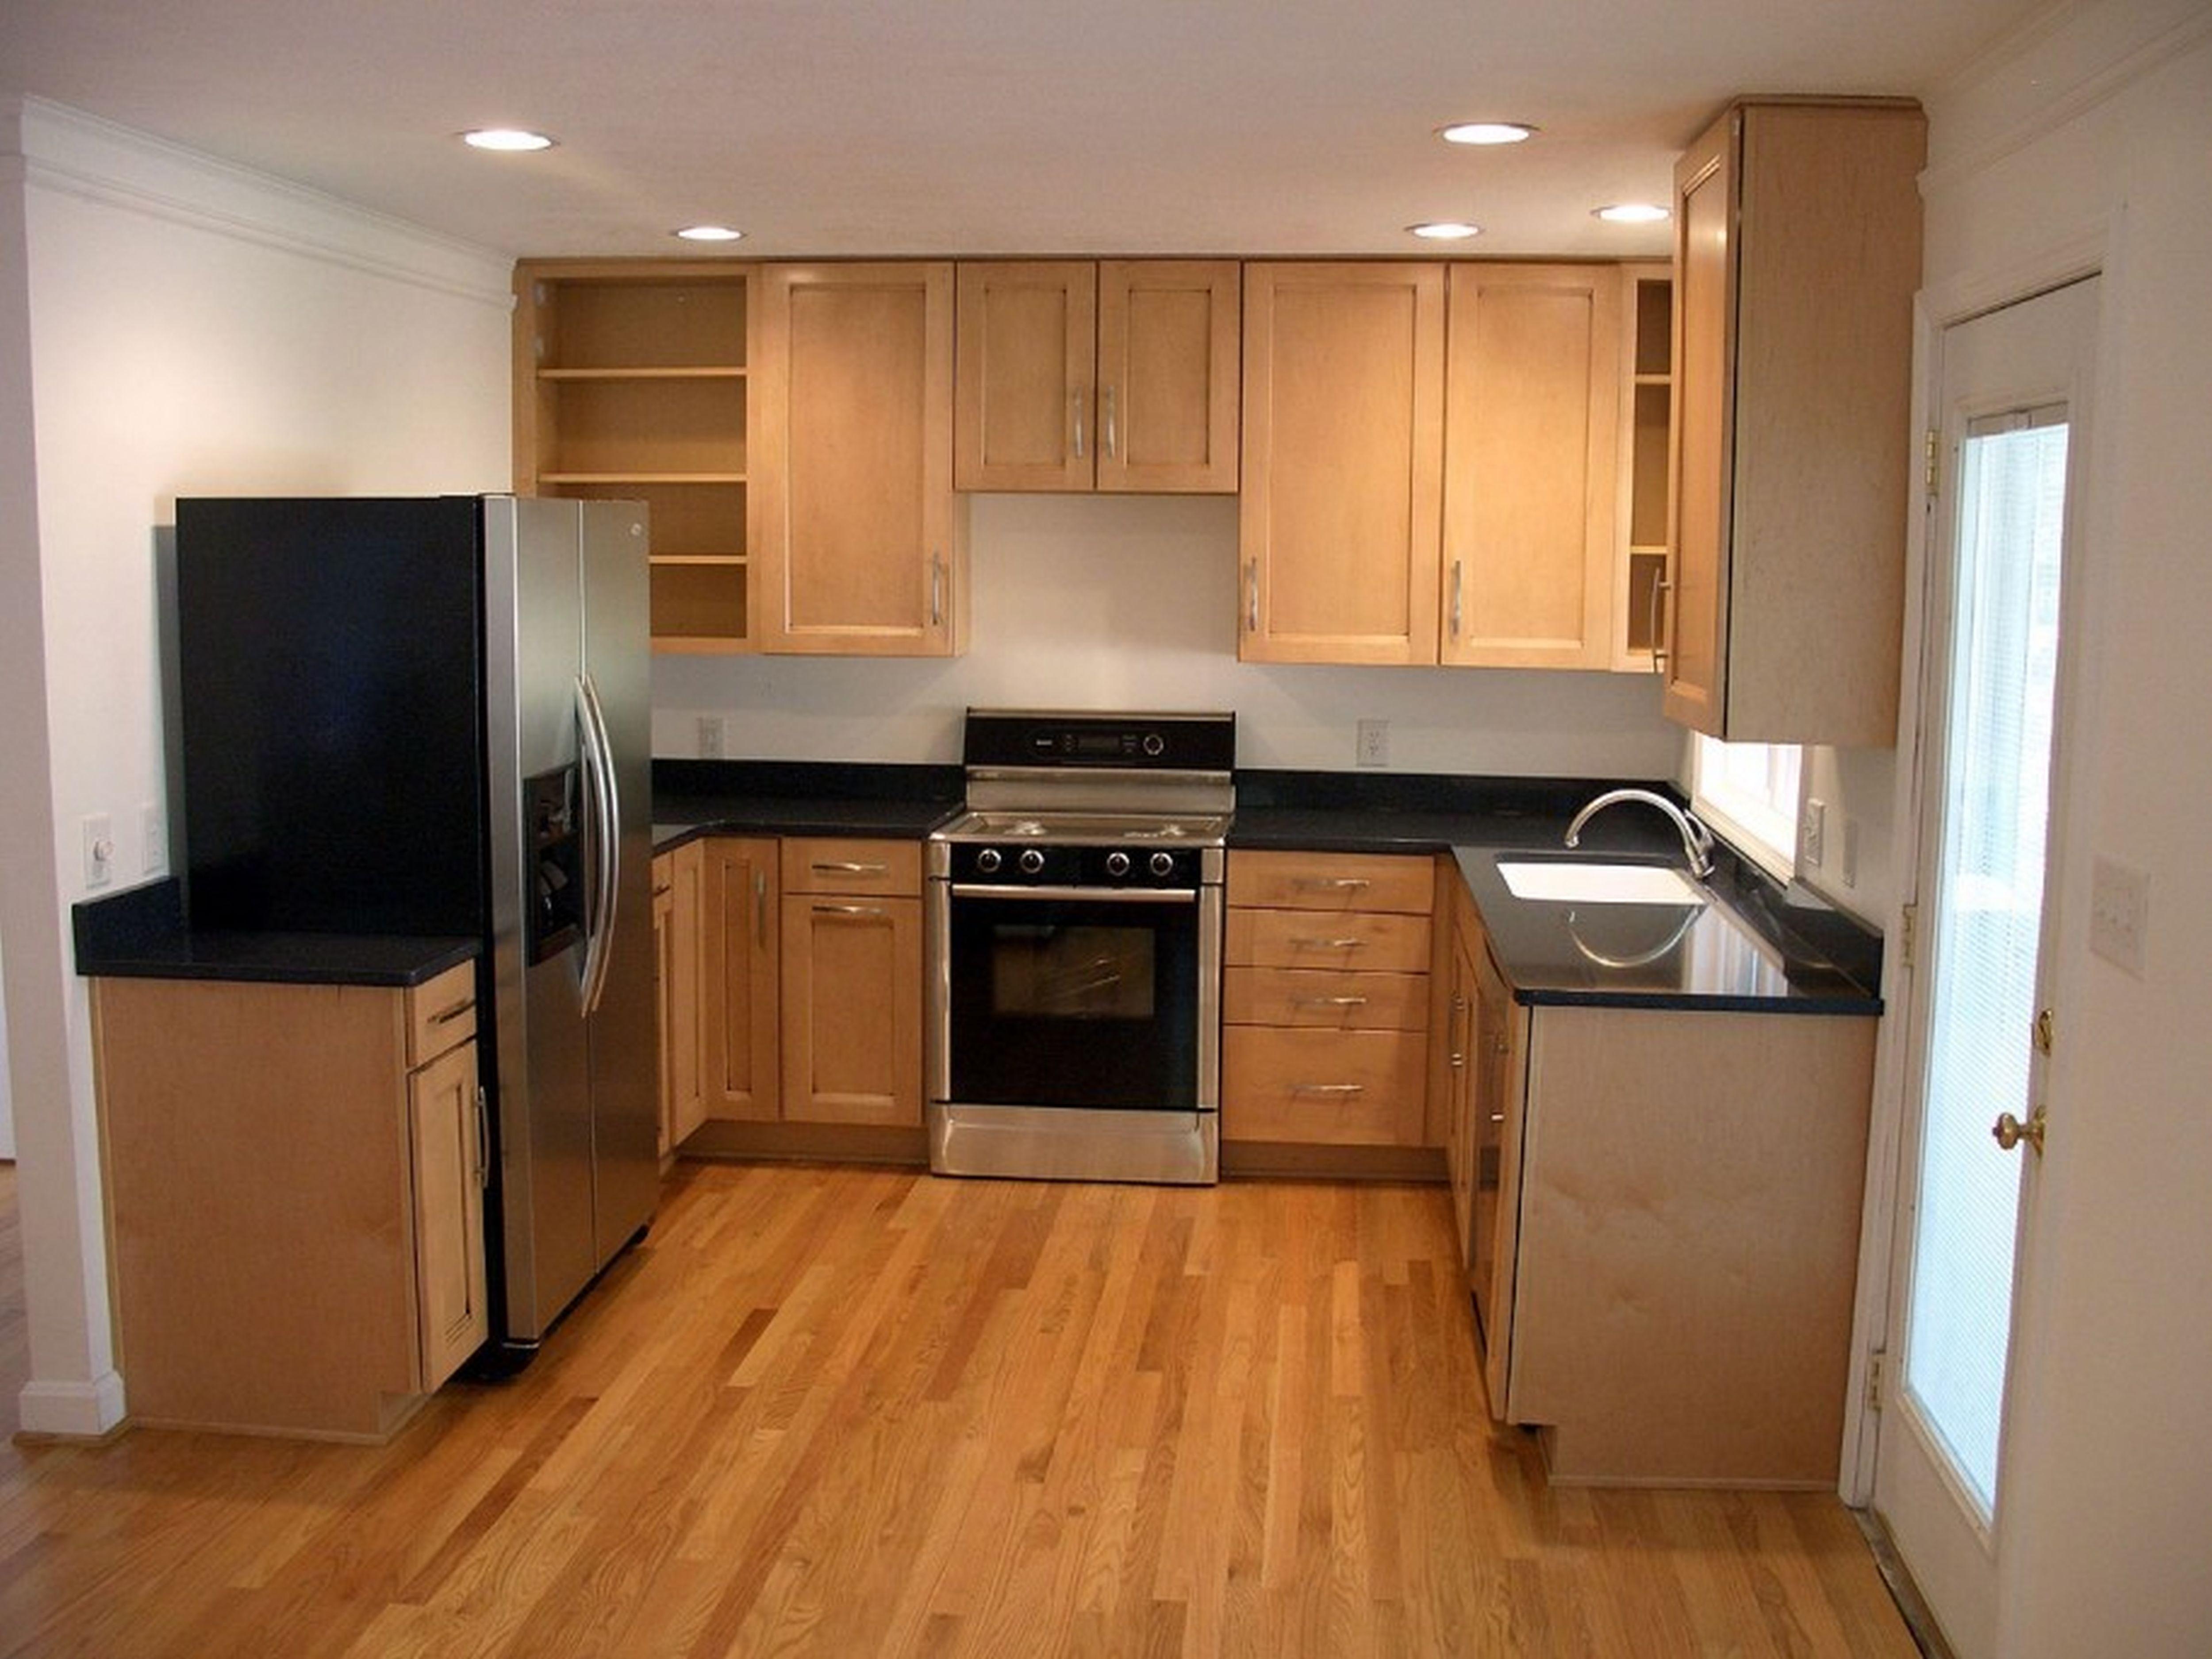 u shaped kitchen cabinets photo - 10